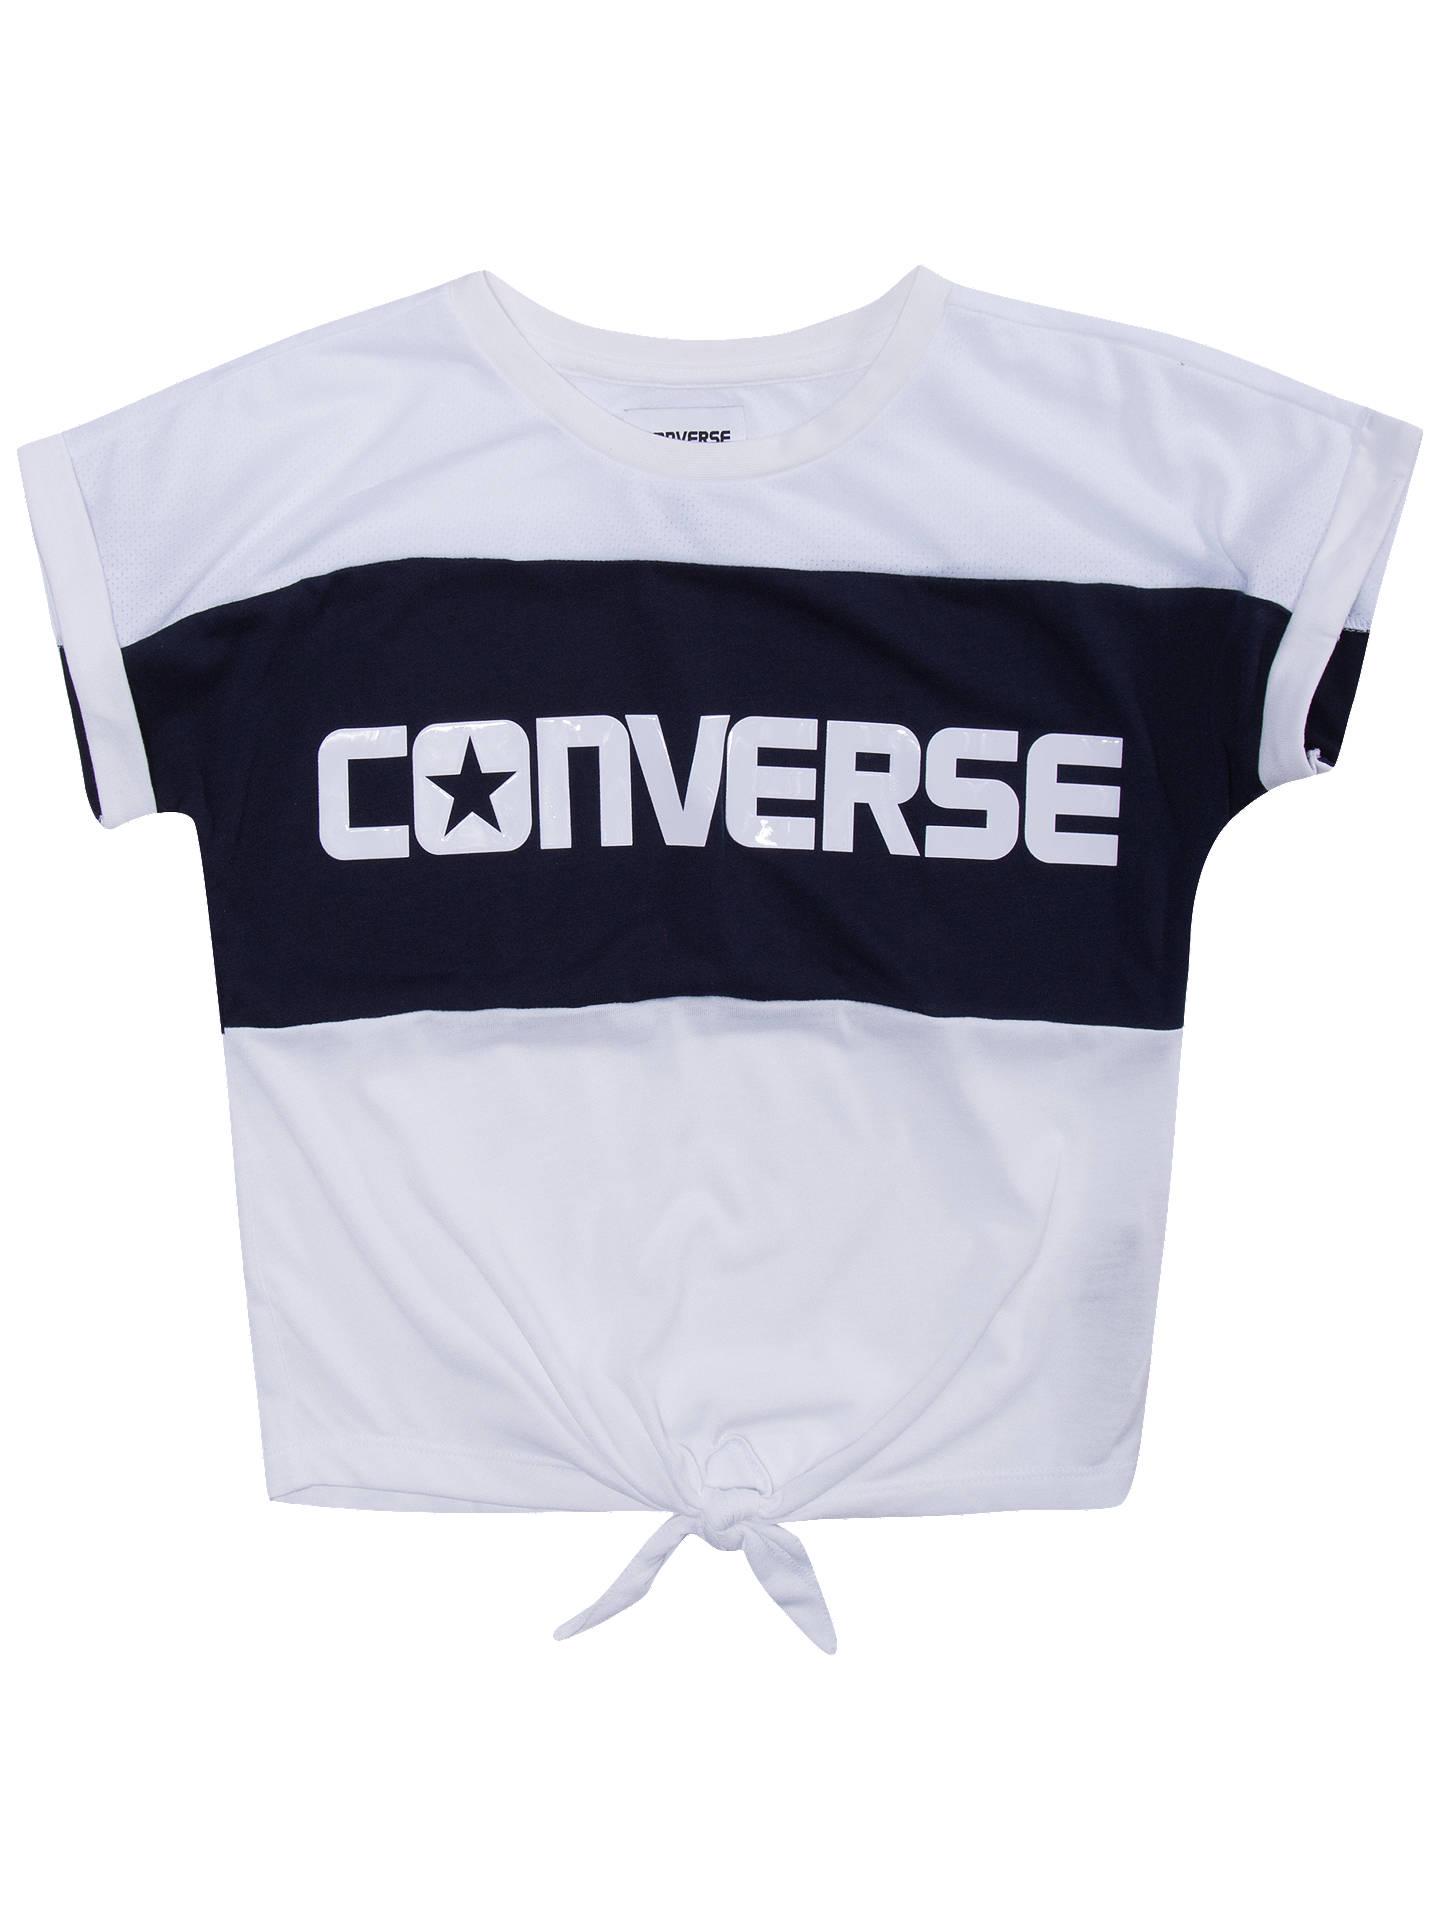 bfe5d8d7dfaa2 Buy Converse Girls  Colour Block Tie Front T-Shirt